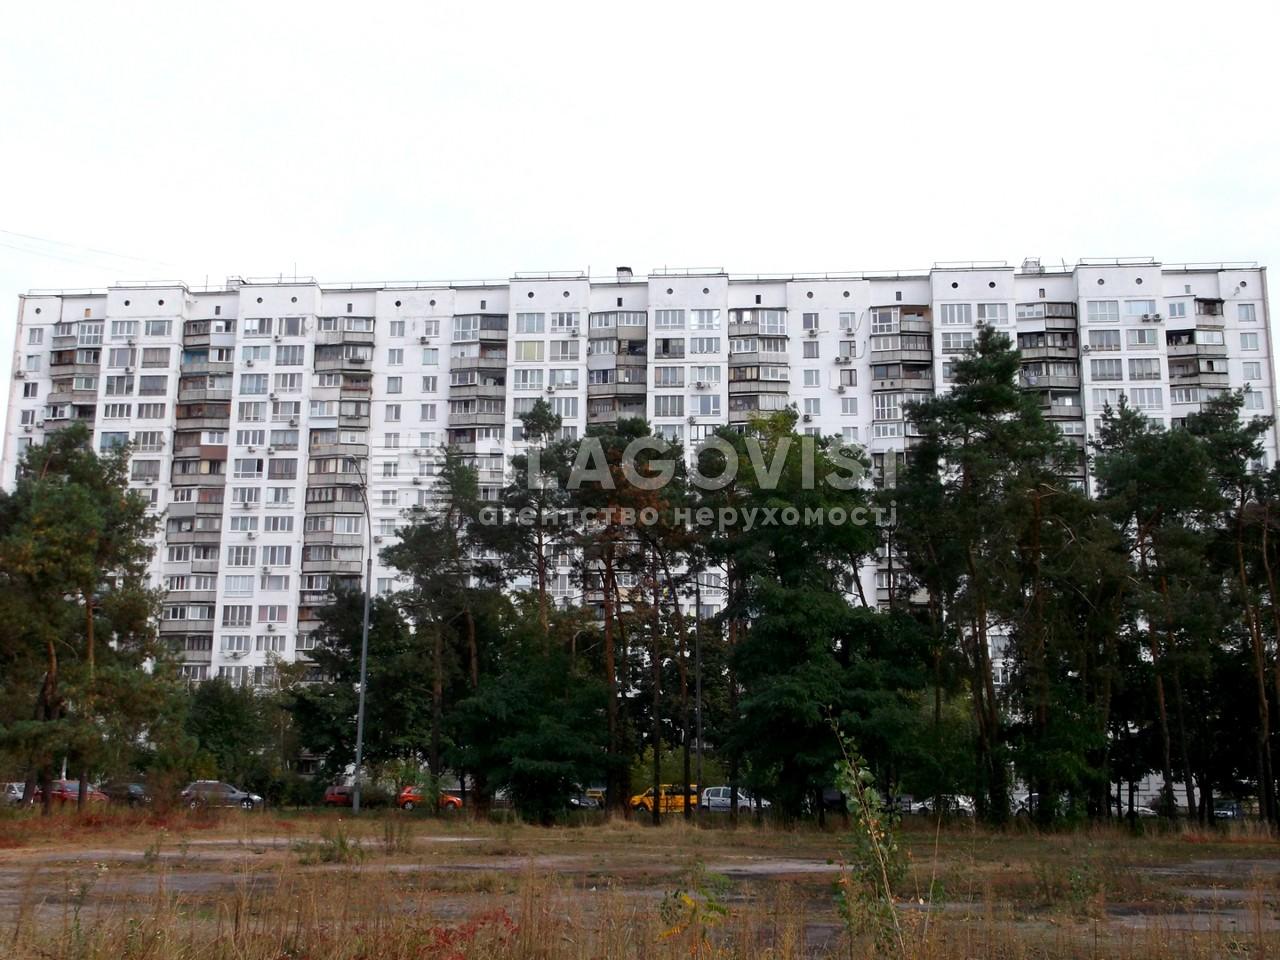 Квартира A-111701, Жмаченко Генерала, 12, Киев - Фото 4